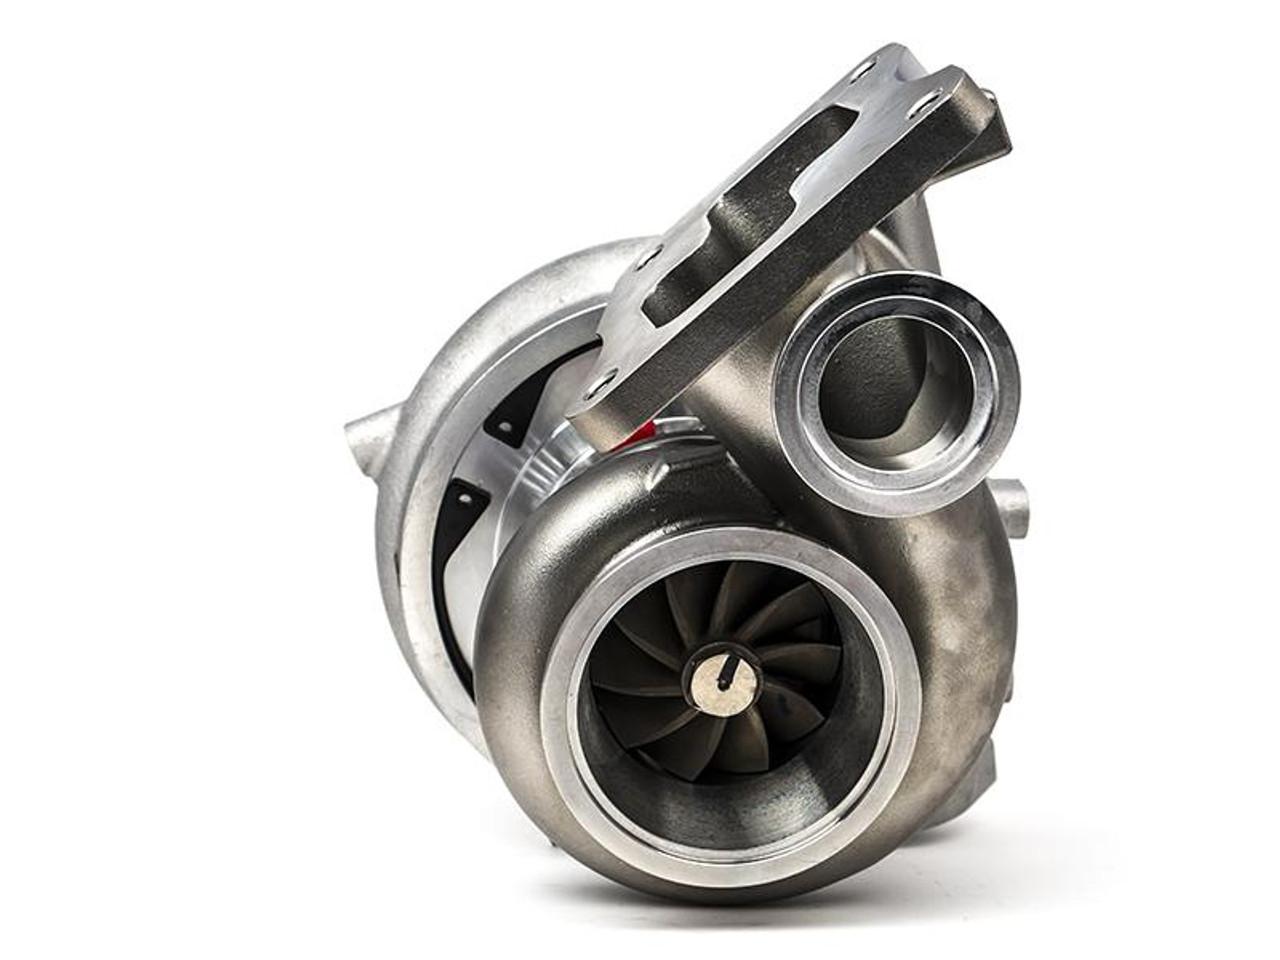 Forced Performance Black BB Turbocharger For Mitsubishi Evo 9 - 2005070